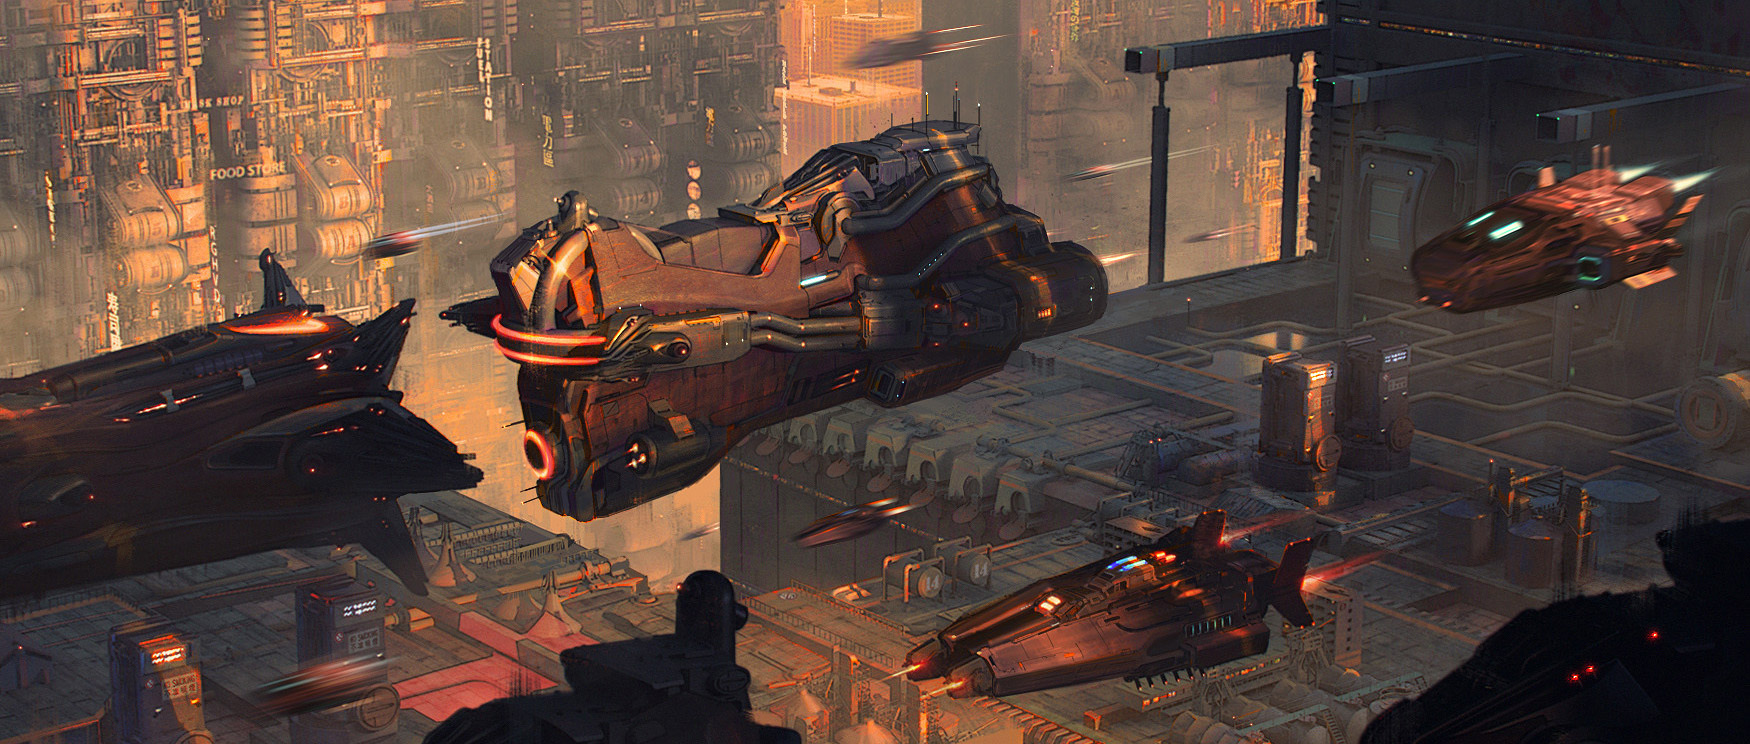 The Sci-Fi Art of Gary Haimeng Cao